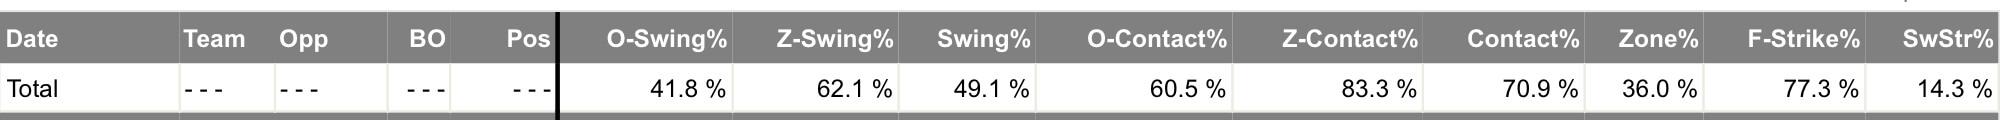 Lourdes Gurriel Swing Percentages Before Demotion